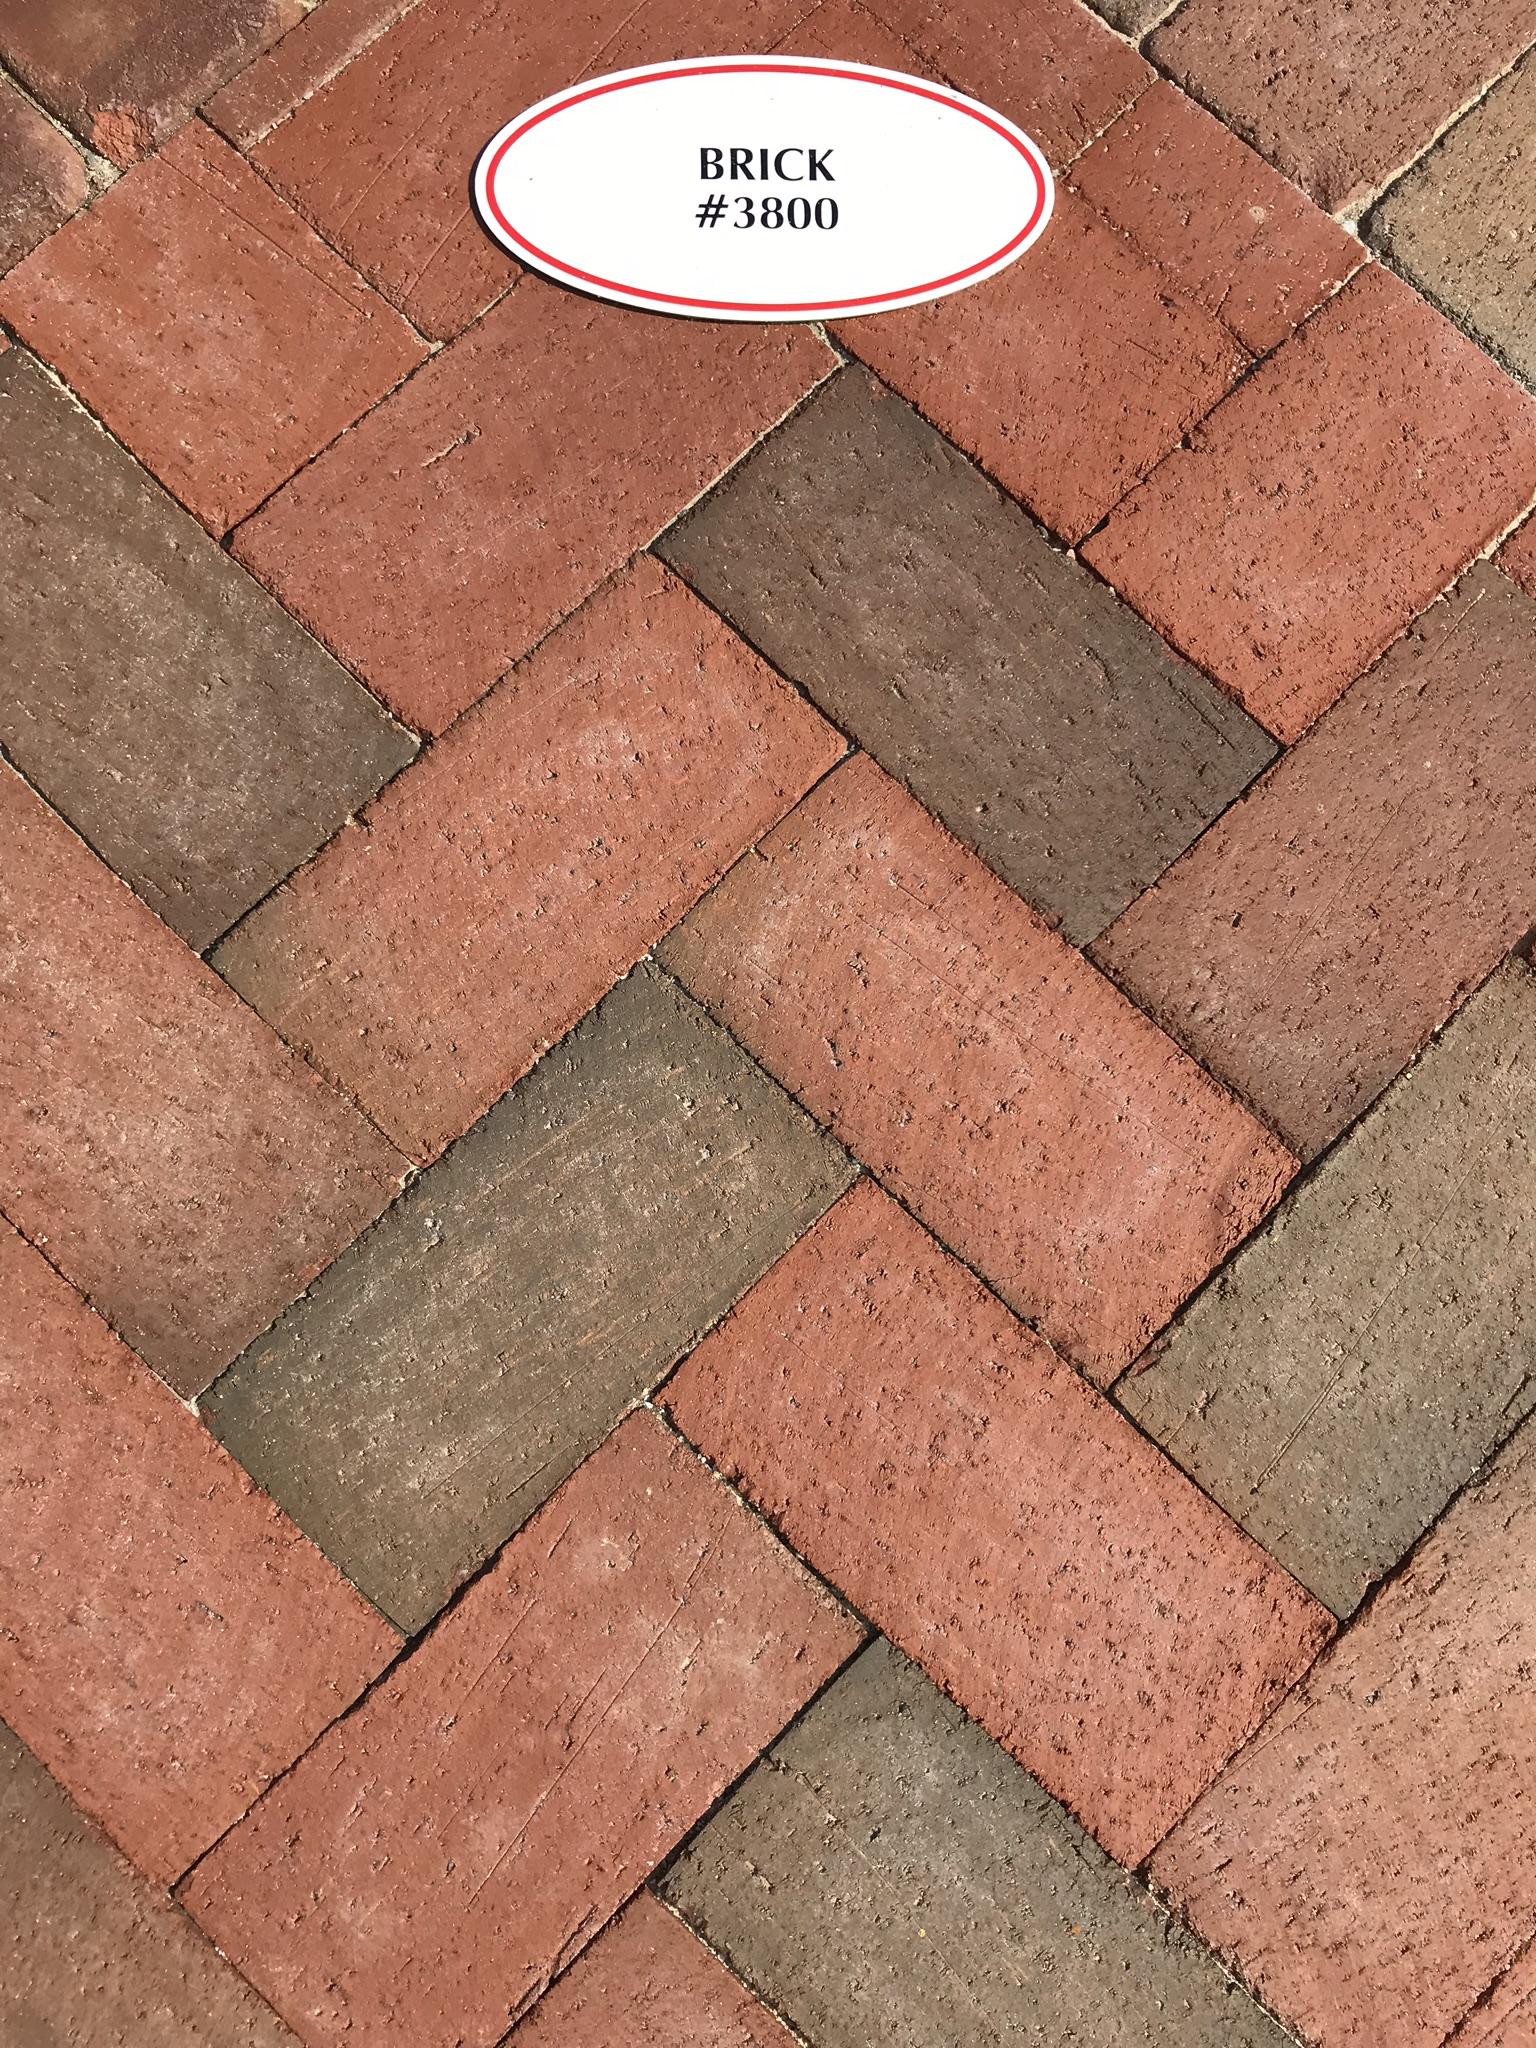 Brick #3800